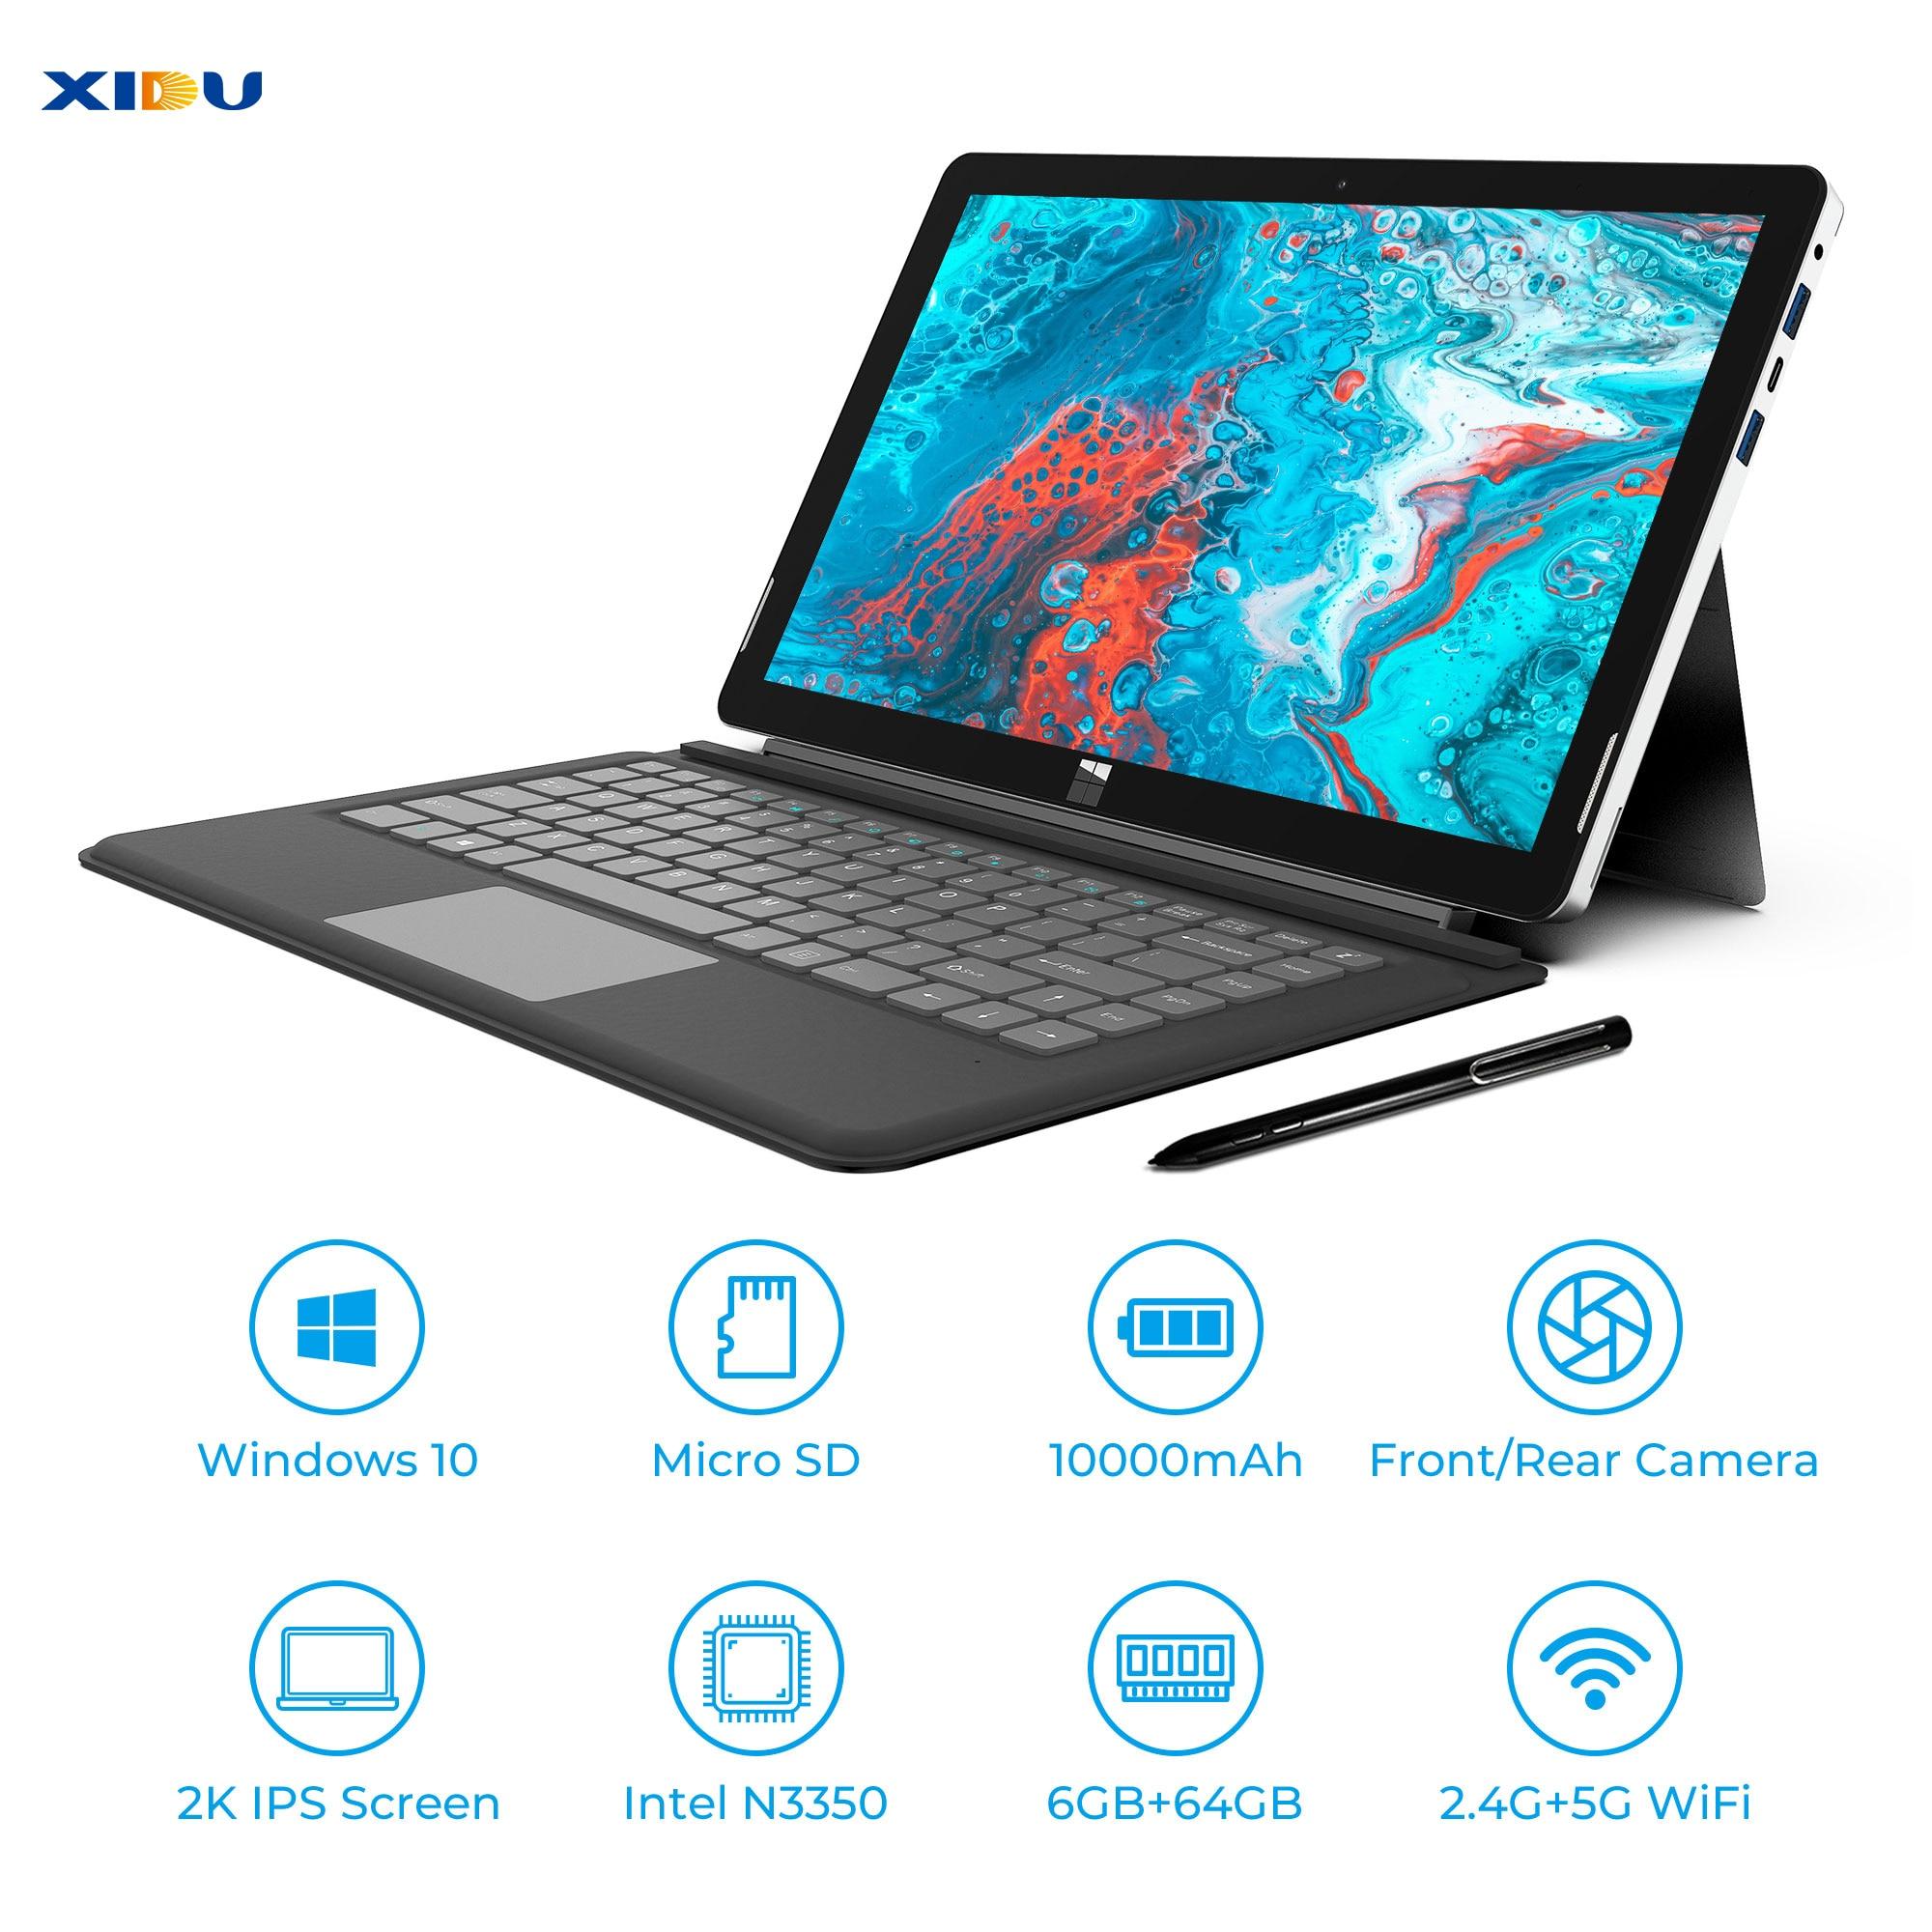 "XIDU Philpad Dual Core Windows 10 Tablets 6GB RAM 64GB ROM 13.3"" N3350 Laptop 2560x1440 Display Dual WIFI With Tablet Pen"